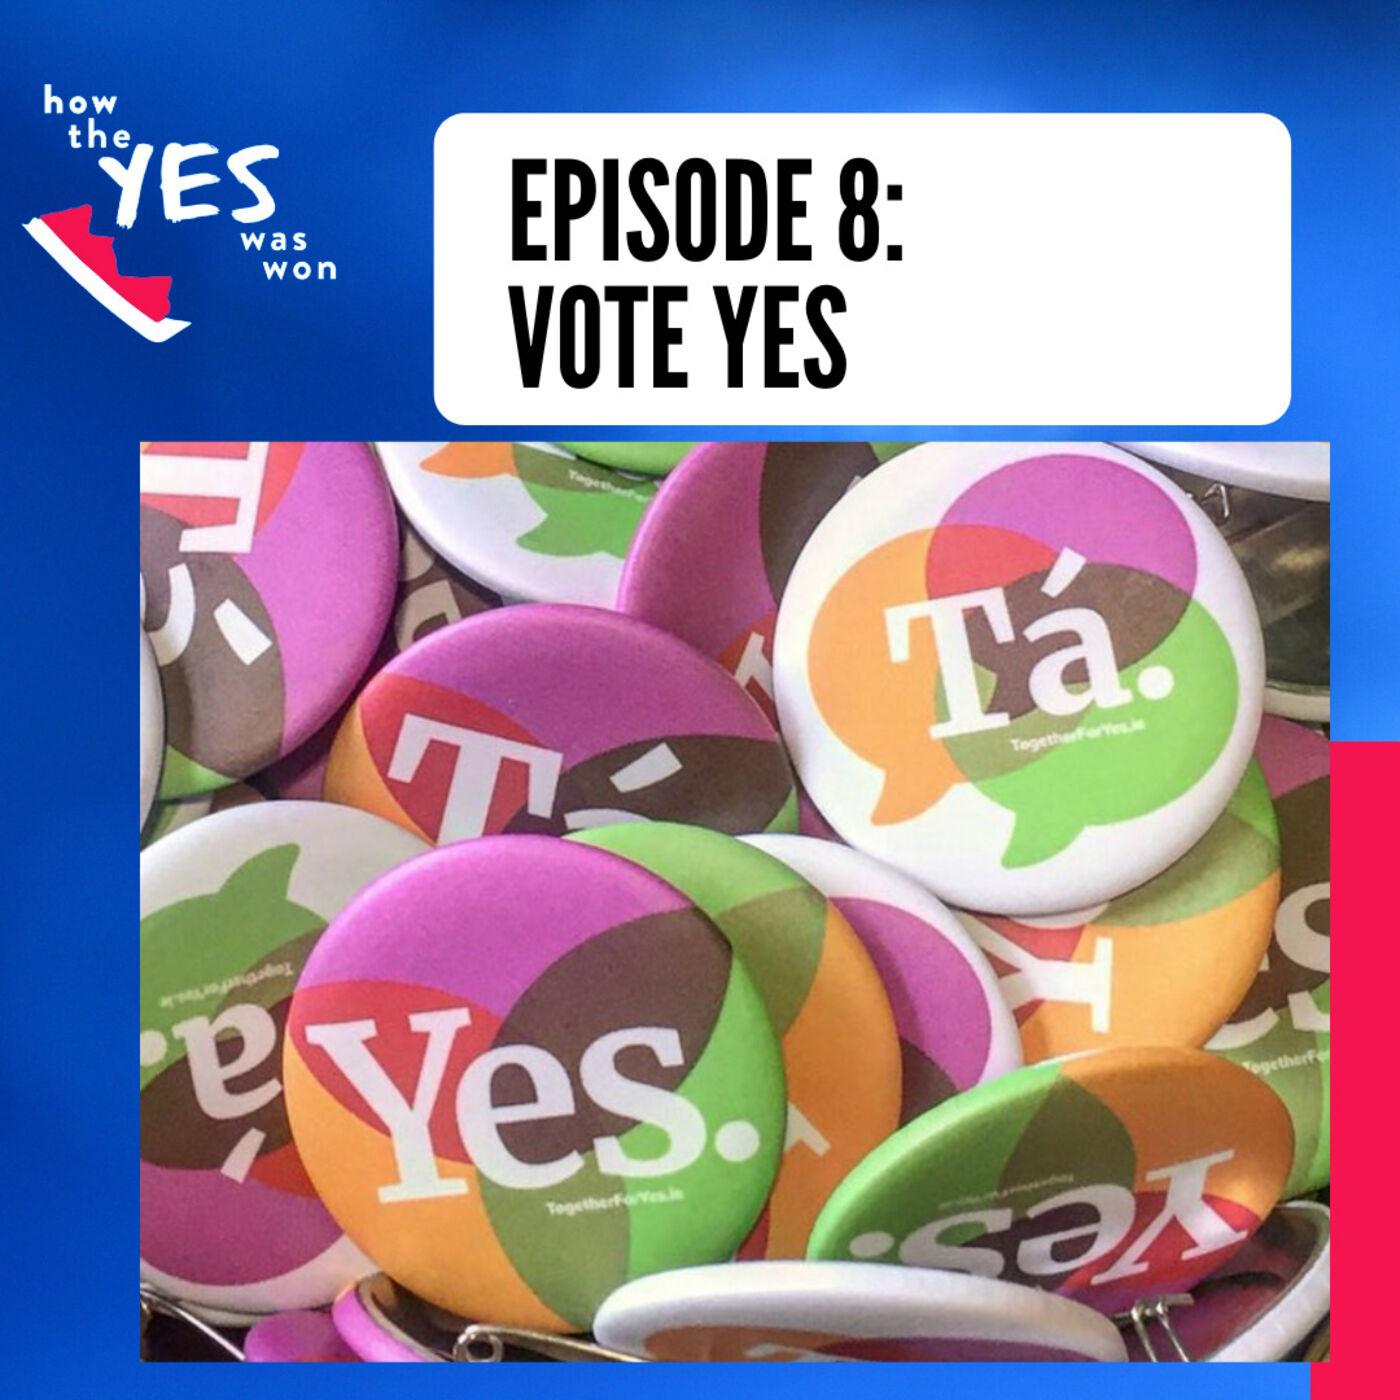 Episode 8: Vote Yes